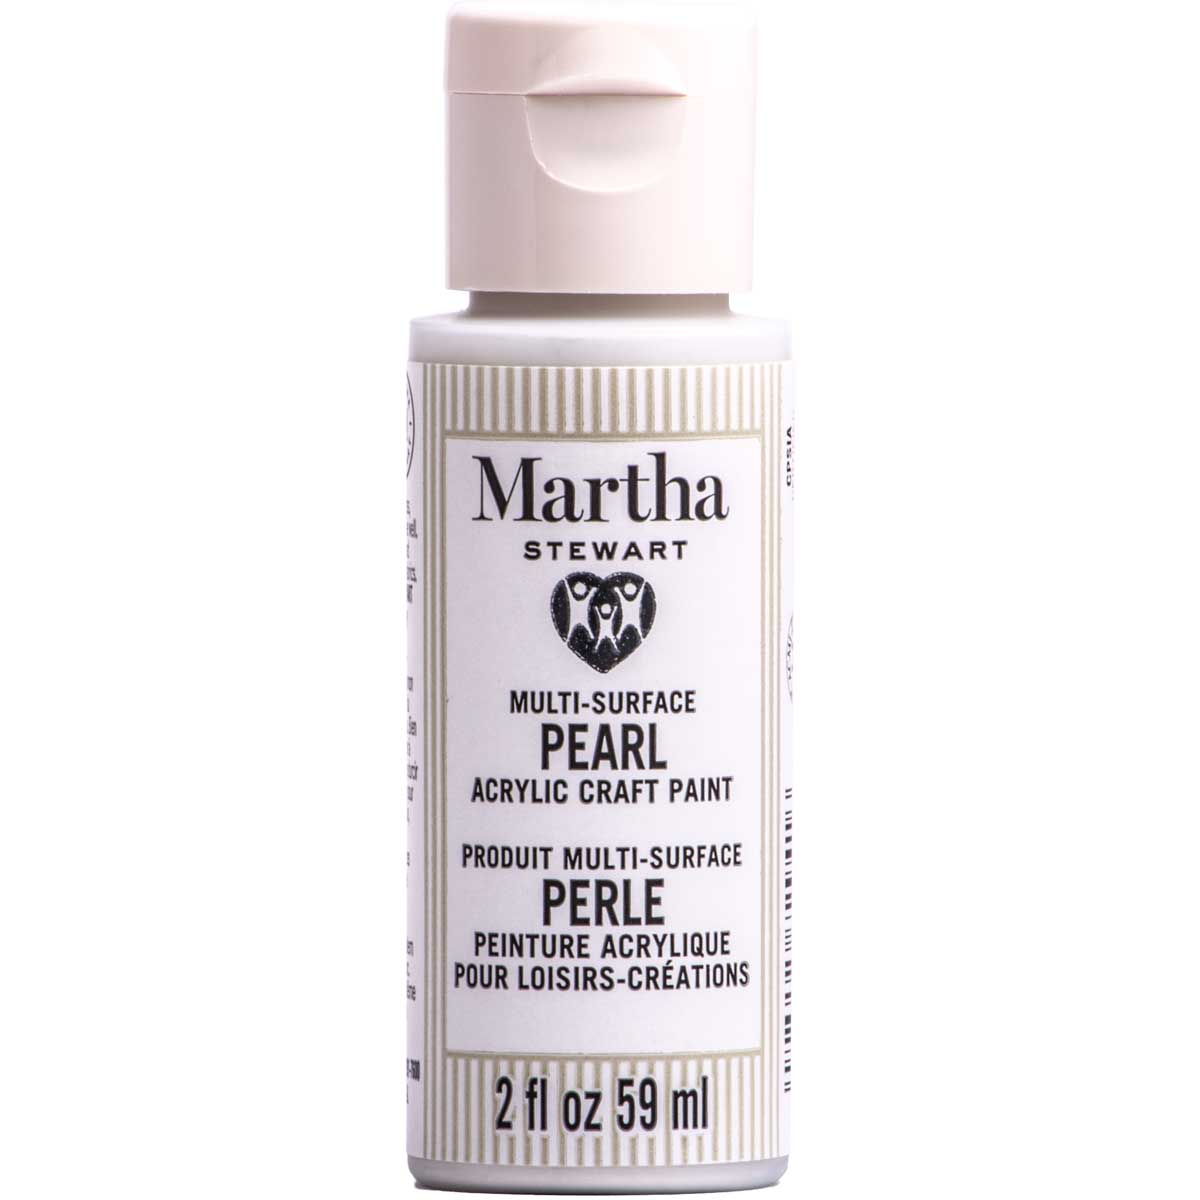 Martha Stewart ® Multi-Surface Pearl Acrylic Craft Paint CPSIA - Moonstone, 2 oz. - 72941